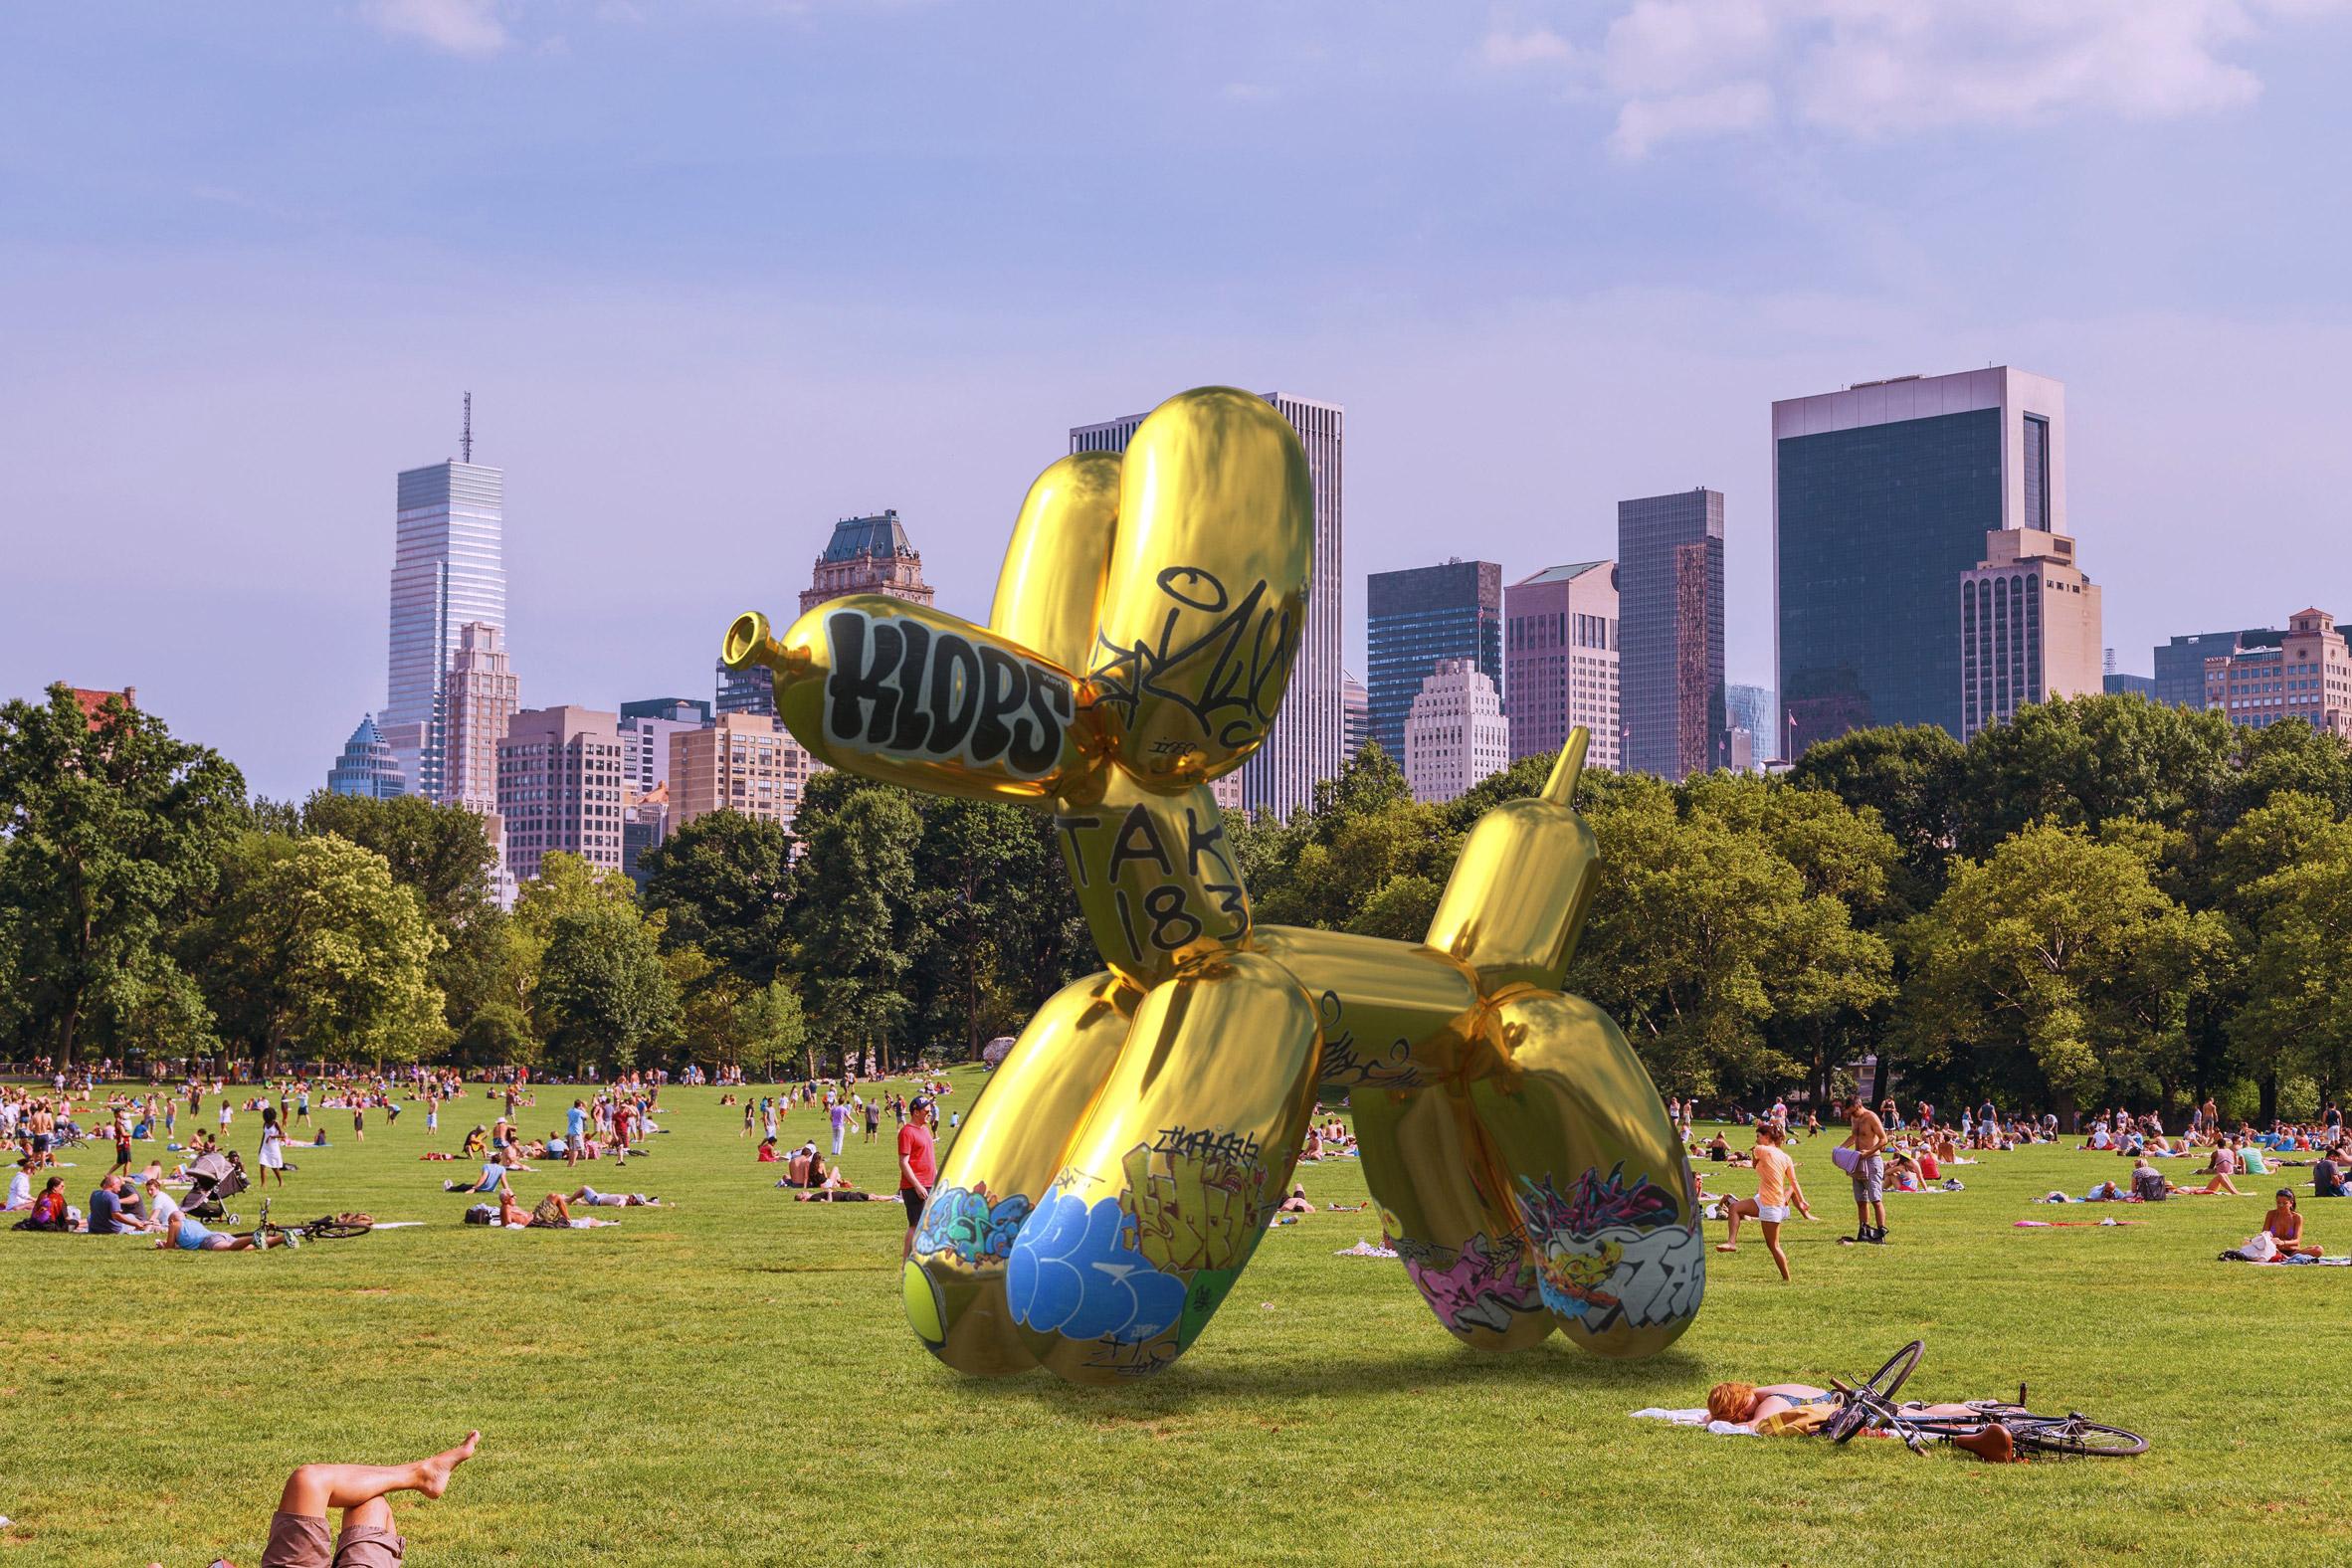 Sebastian Errazuriz vandalises augmented-reality version of Jeff Koons' Balloon Dog sculpture